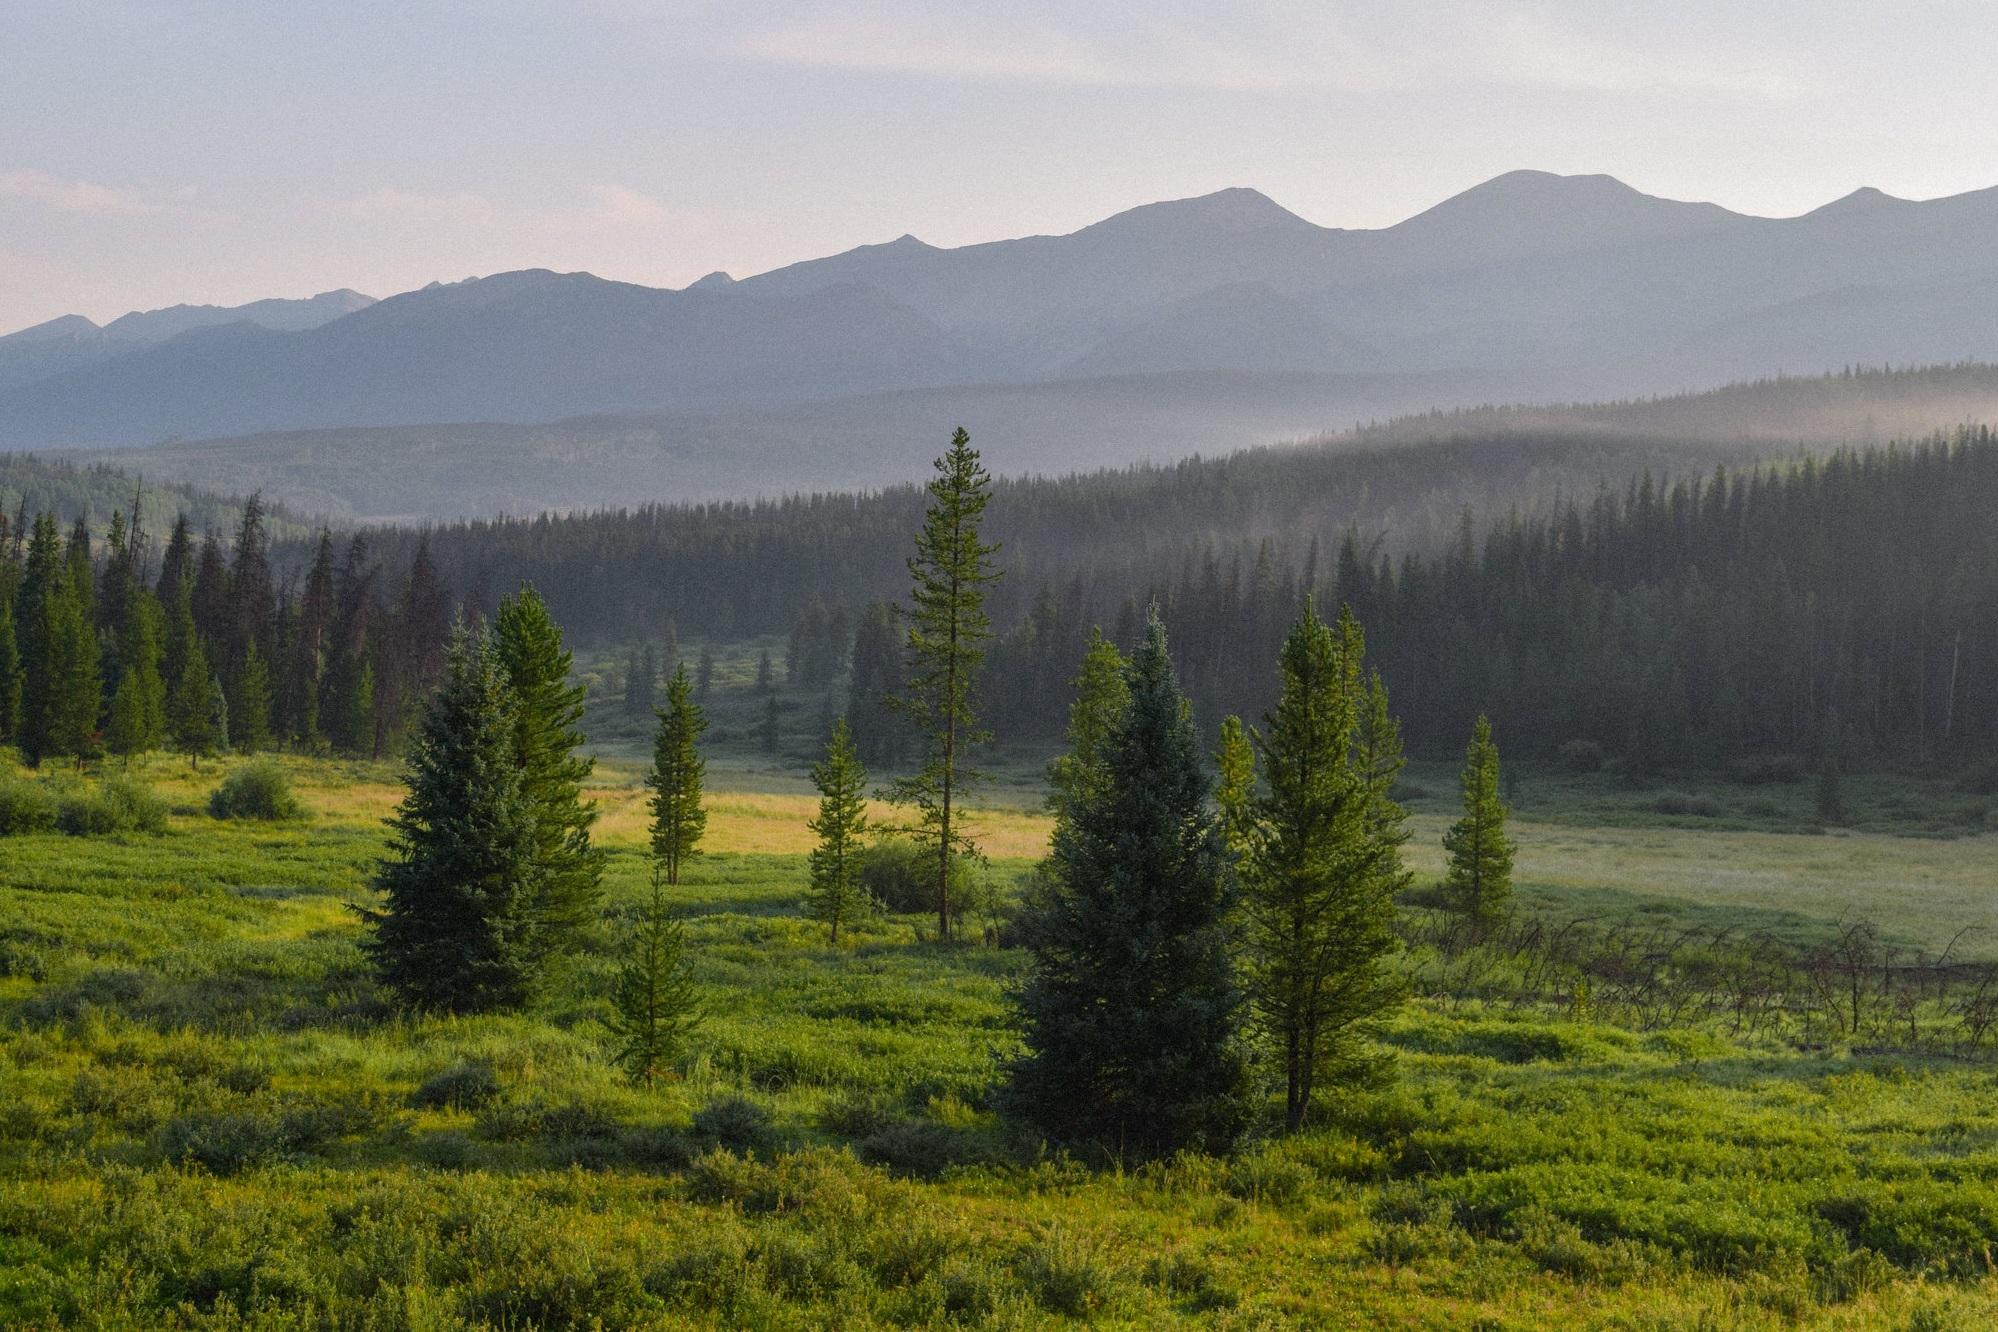 Mountain Riparian Restoration Project